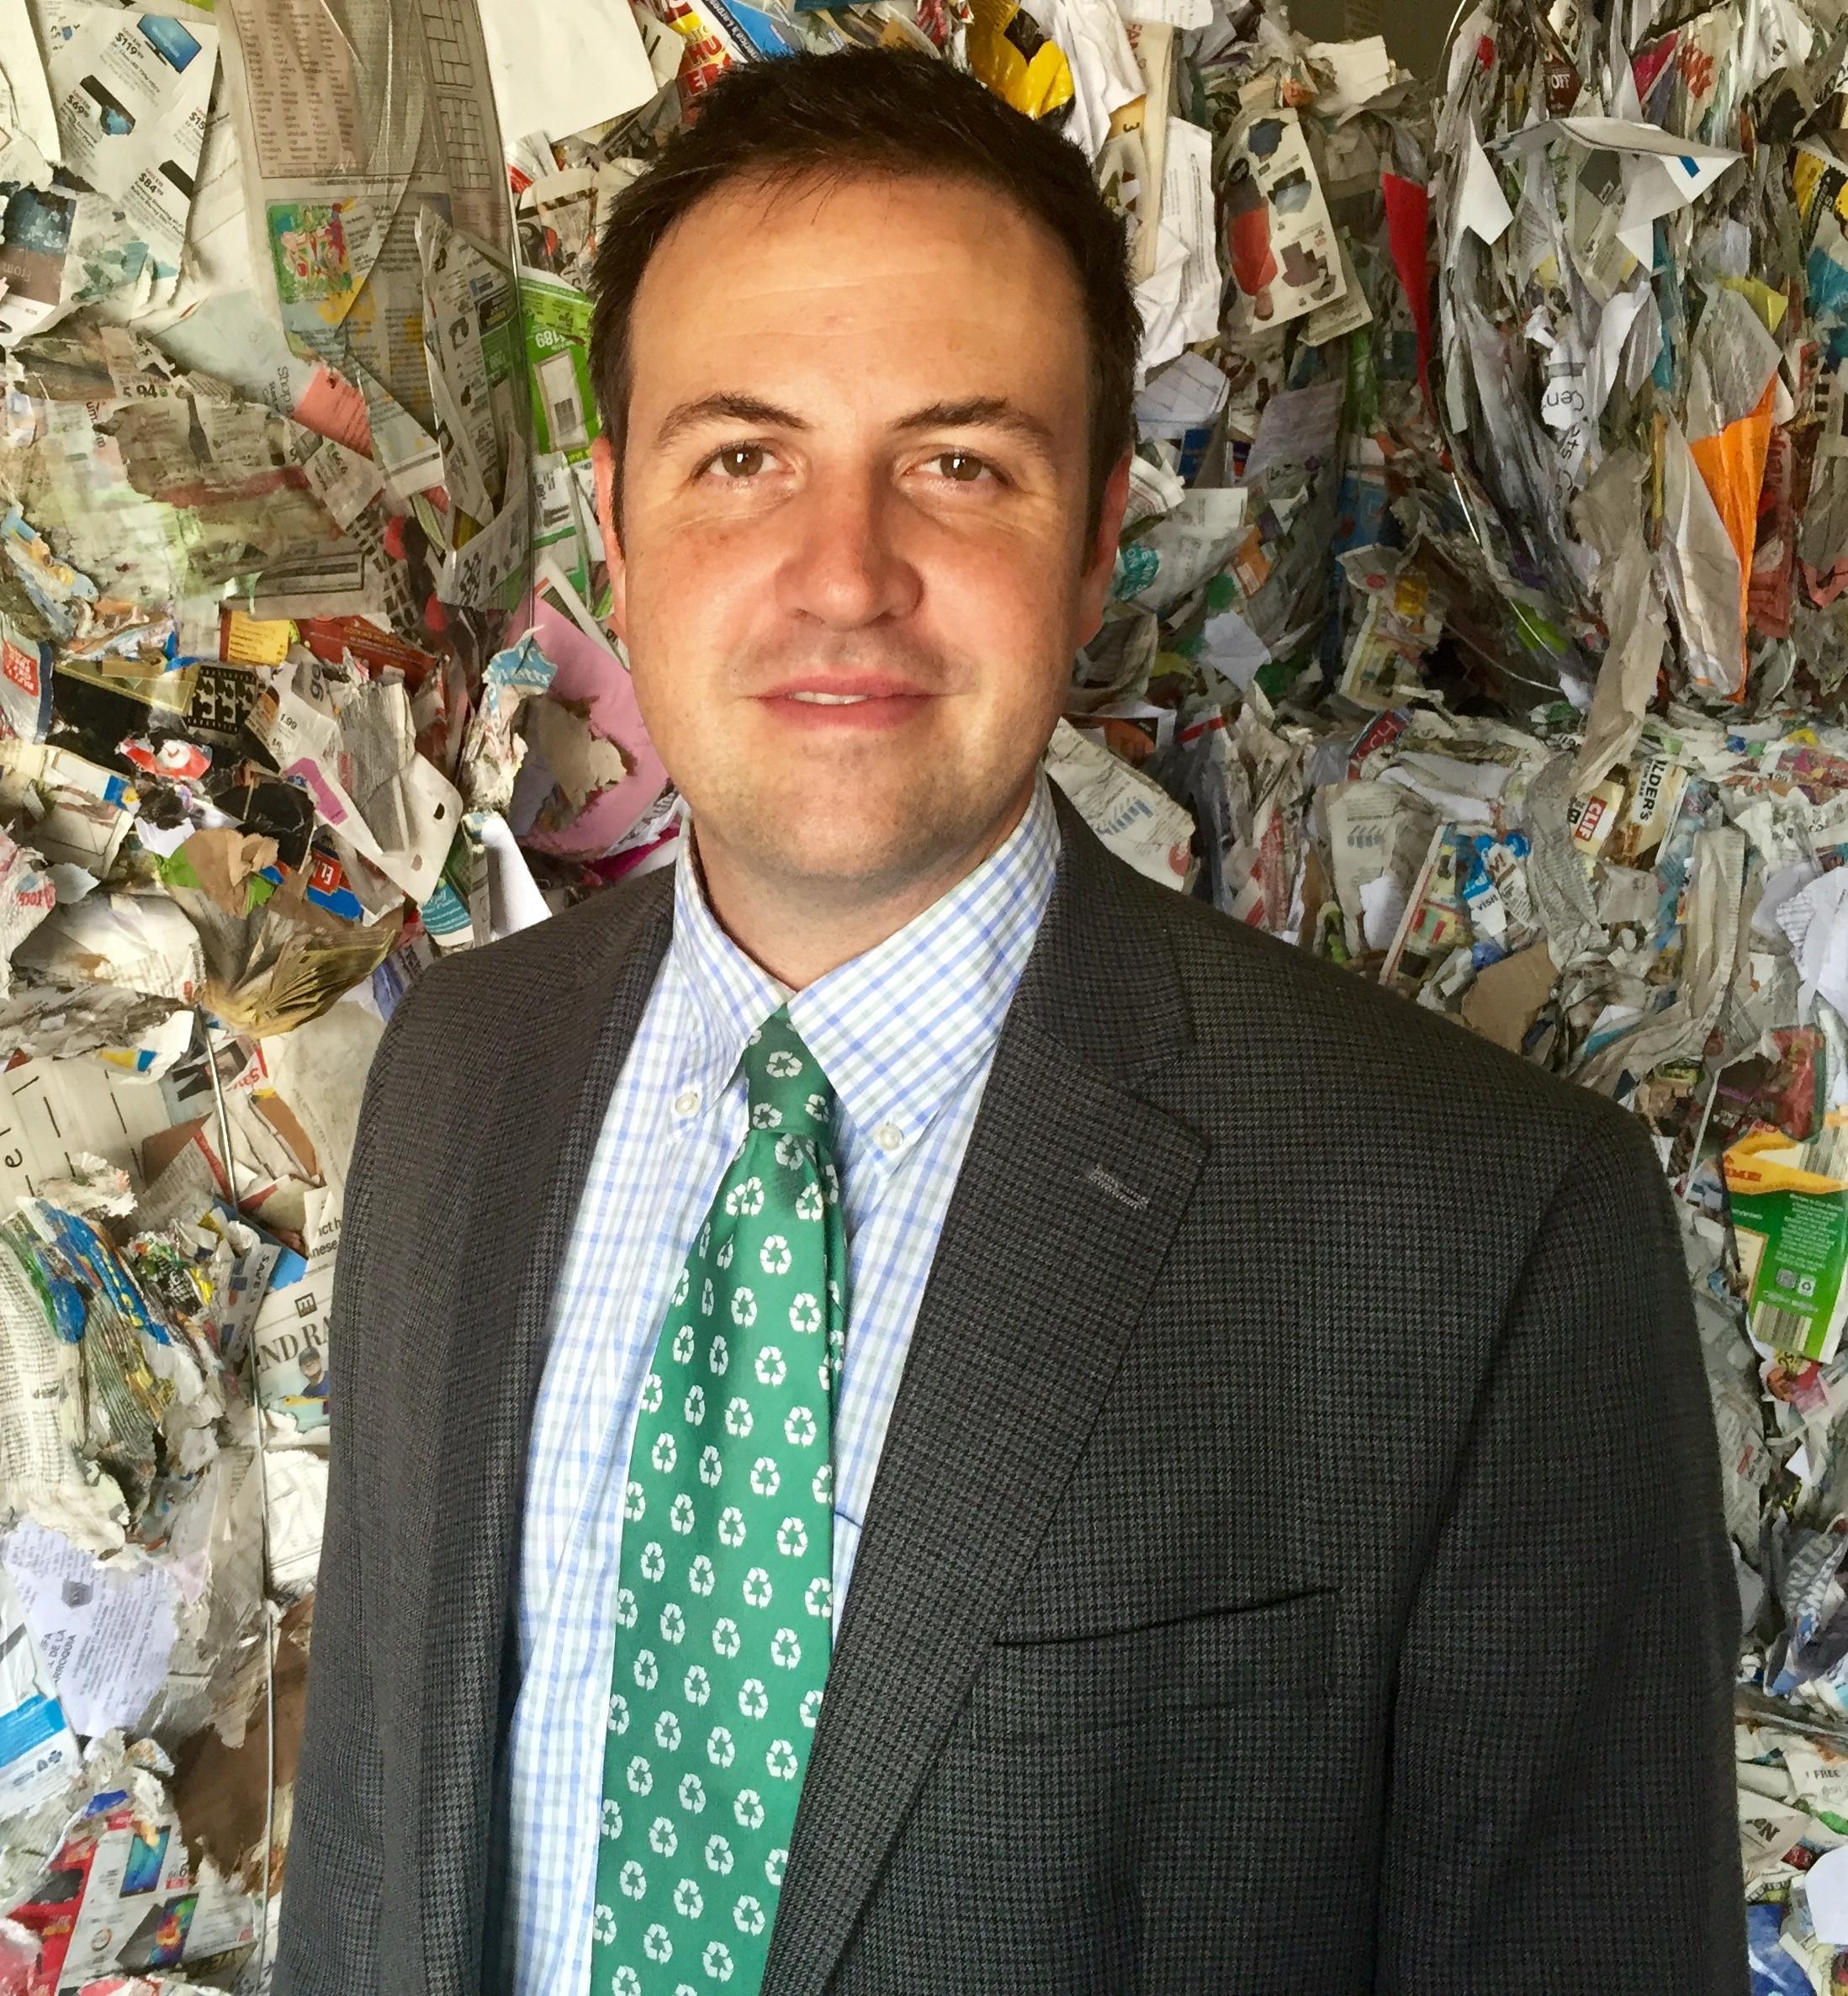 Matt Flechter - Michigan Department of Environment, Great Lakes, and Energy